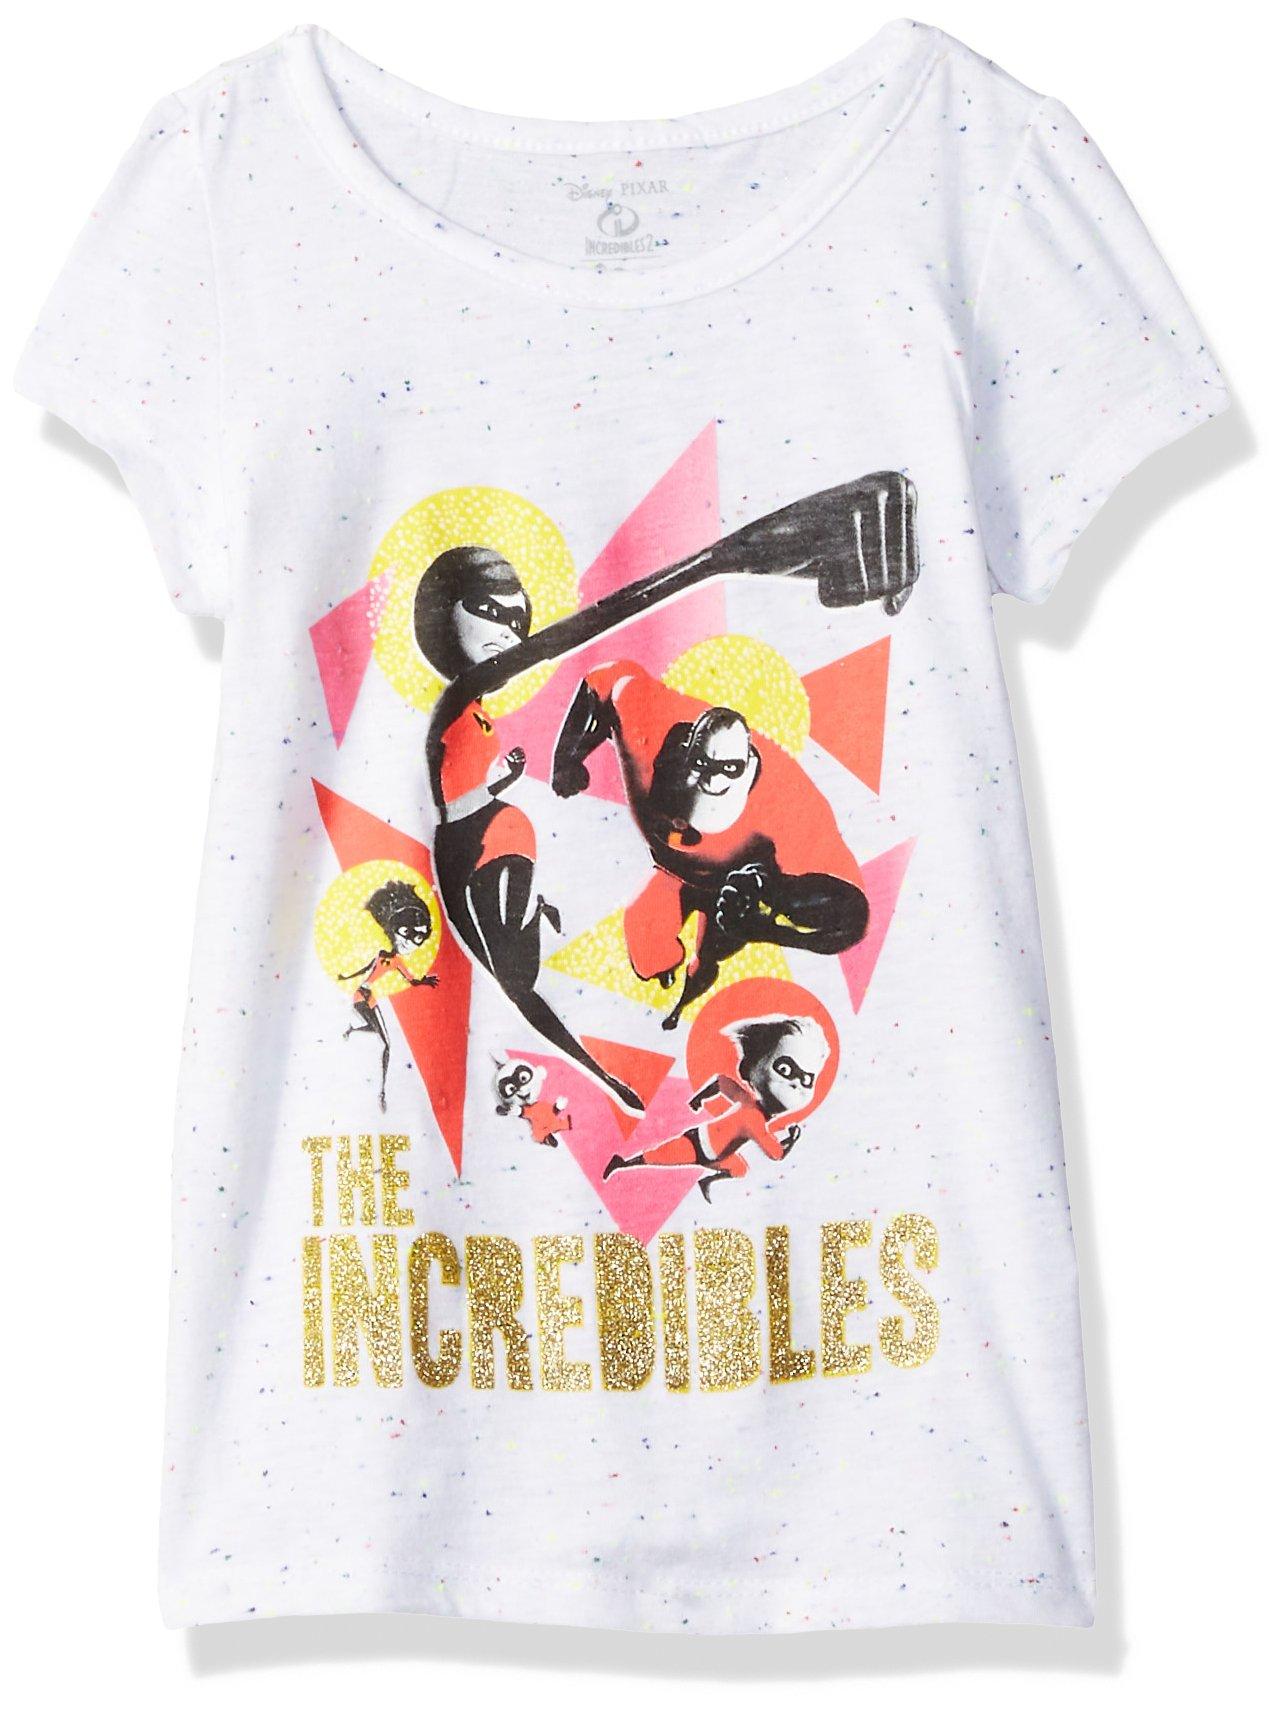 Disney Toddler Girls' The Incredibles 2 Family Group Short Sleeve T-Shirt, White, 2T